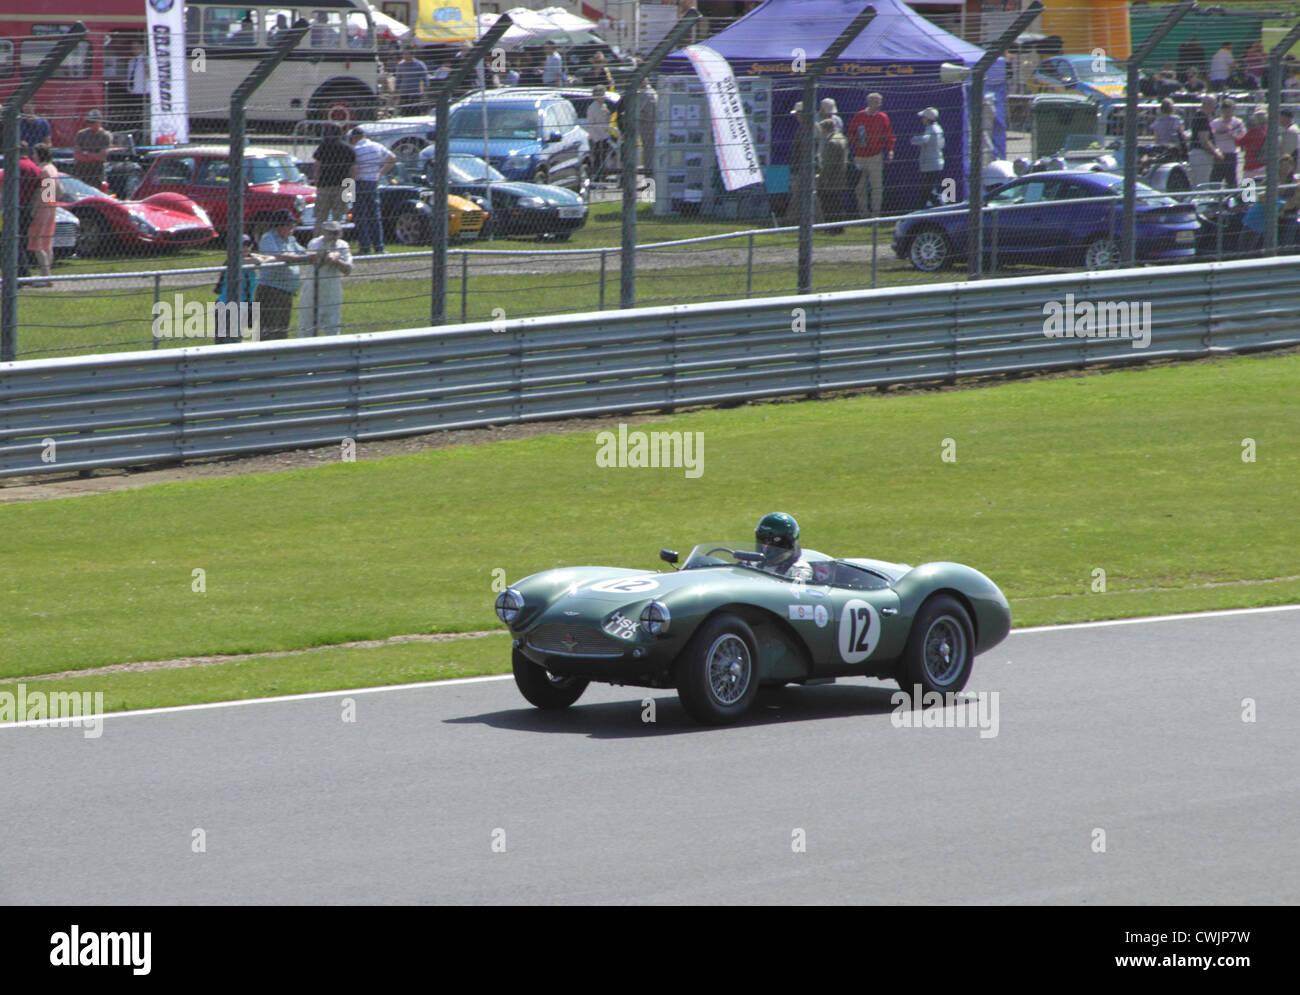 Aston Martin DB3S bei RAC Woodcote Trophy für Pre-56 Sportwagen Silverstone Classic 22. Juli 2012 Stockbild